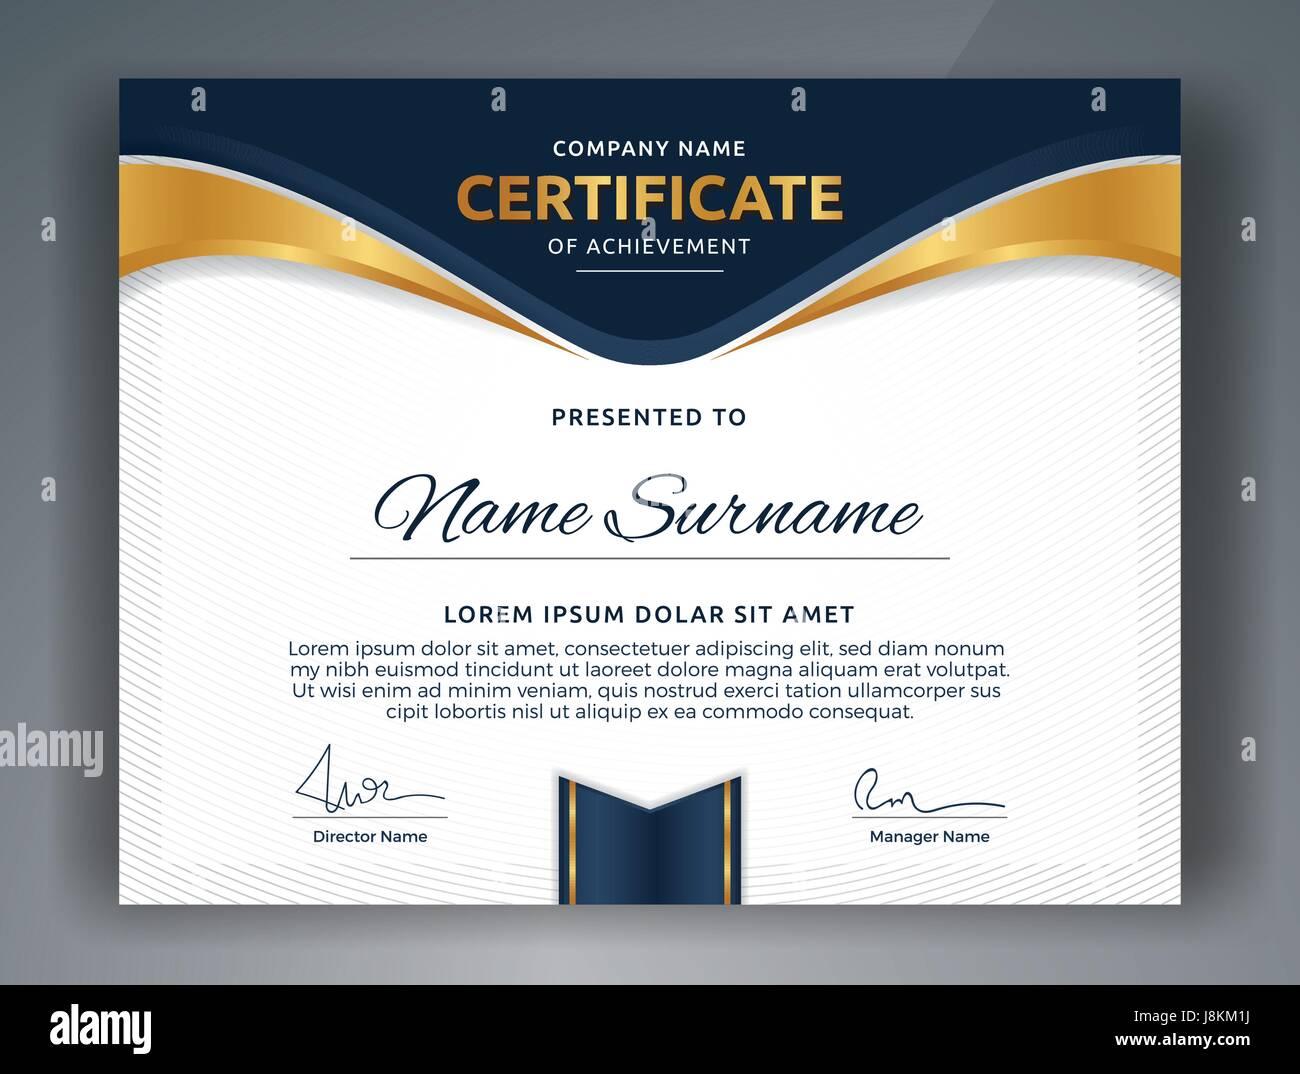 Multipurpose professional certificate template design for print multipurpose professional certificate template design for print vector illustration yelopaper Gallery